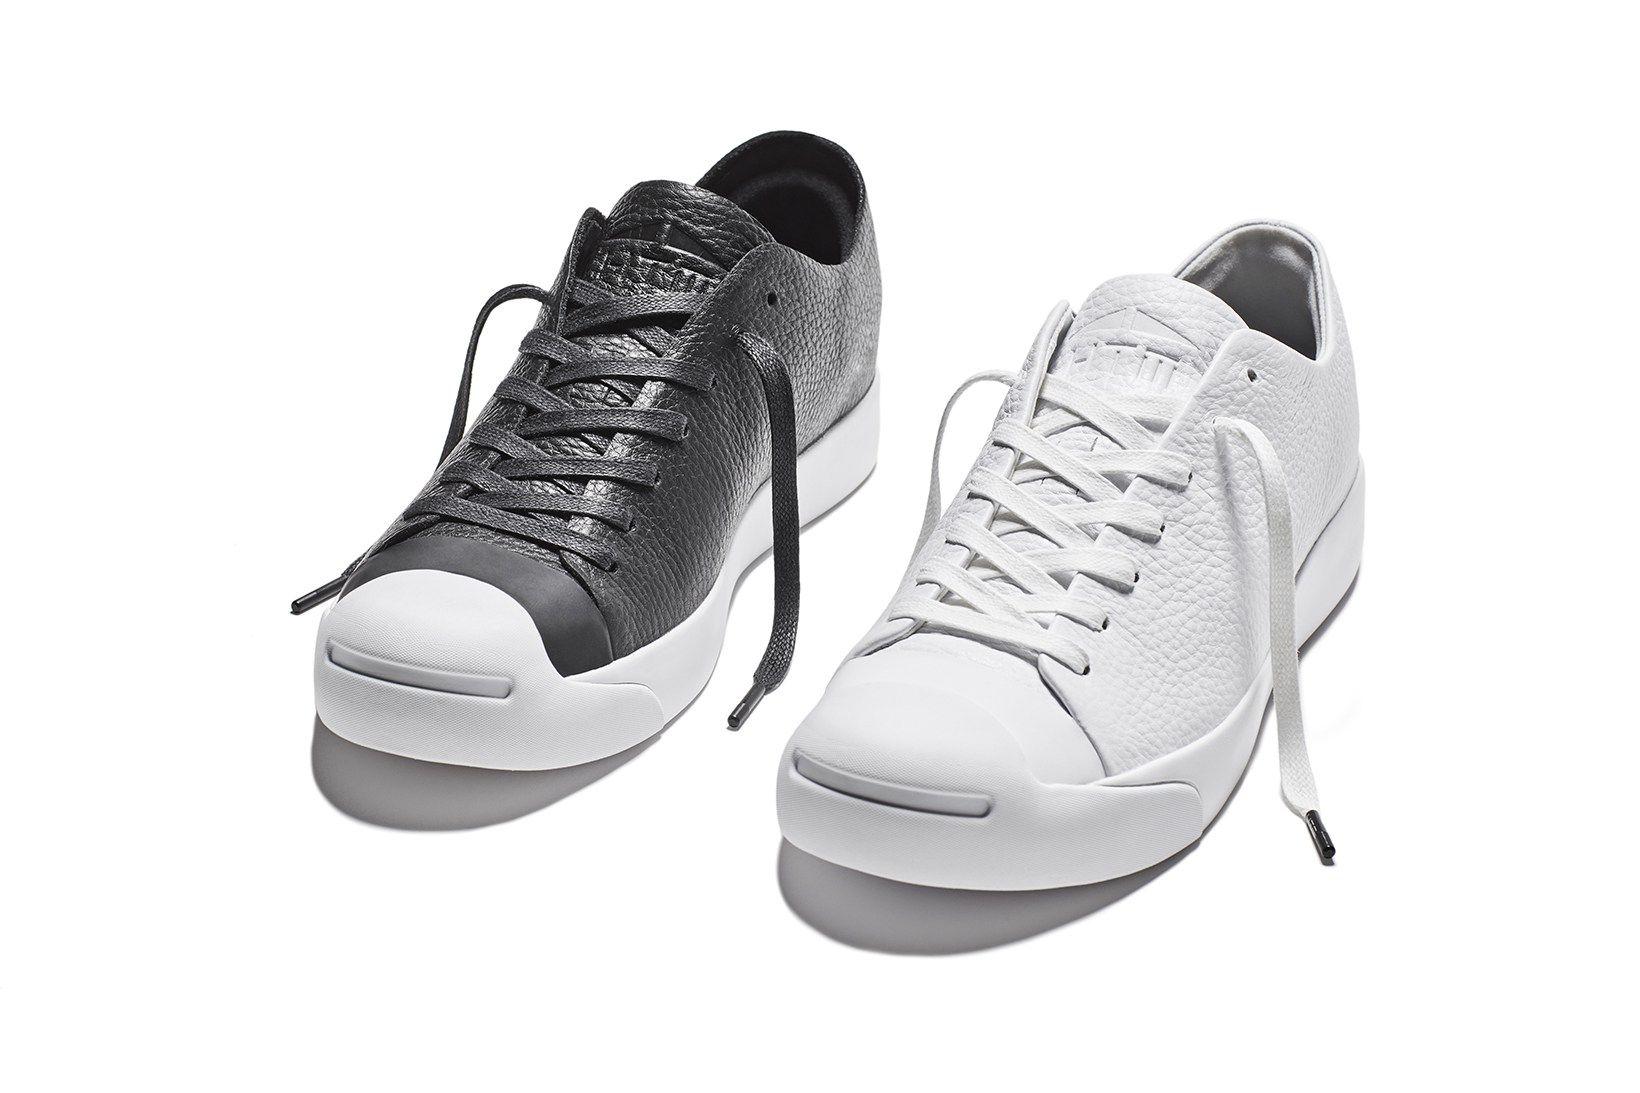 cheap for discount 8ae2c f77a8 Converse Jack Purcell Modern Nike HTM Hiroshi Fujiwara Tinker Hatfield Mark  Parker